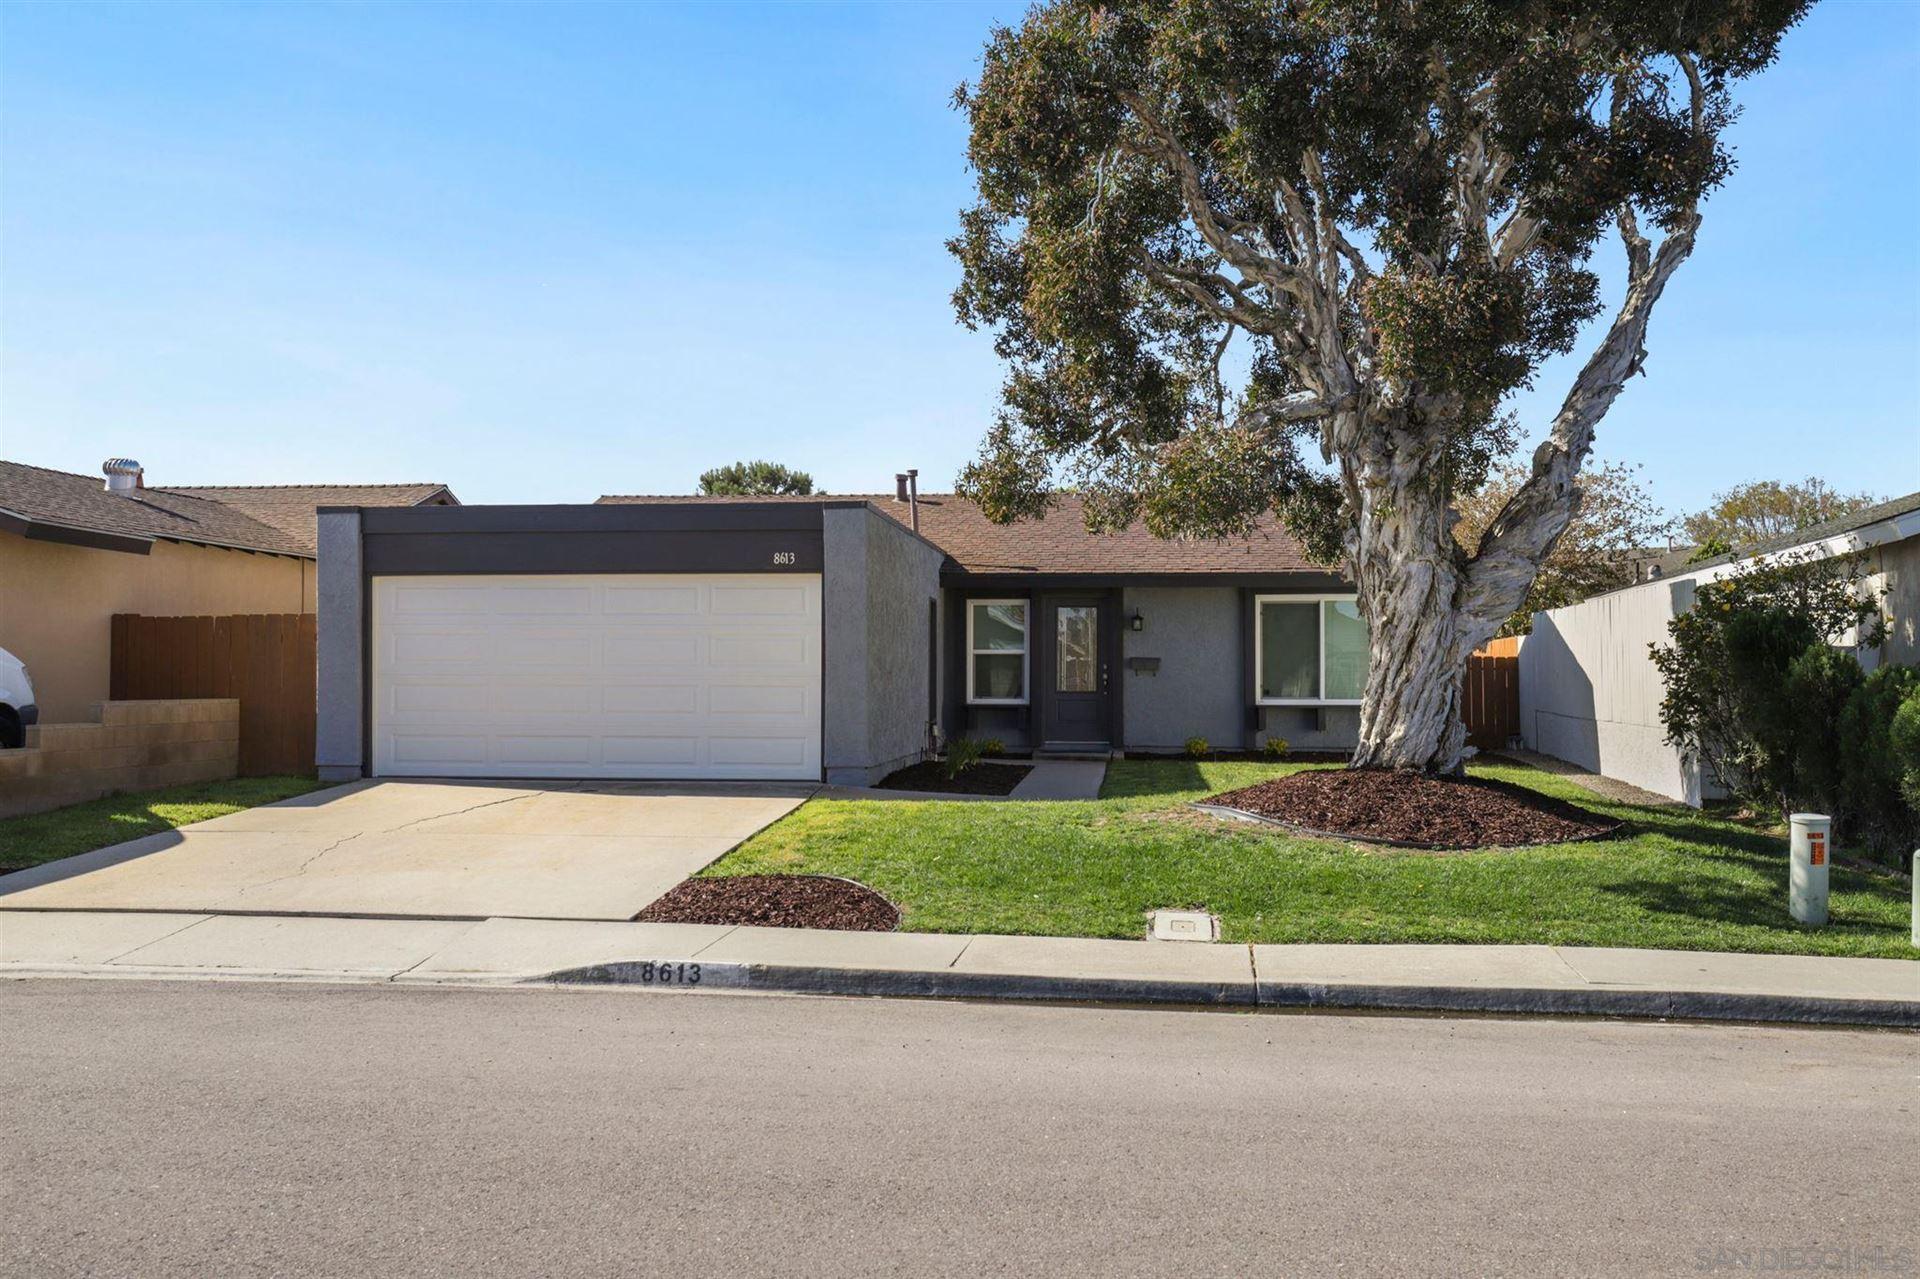 Photo for 8613 Lepus Rd, San Diego, CA 92126 (MLS # 210009011)